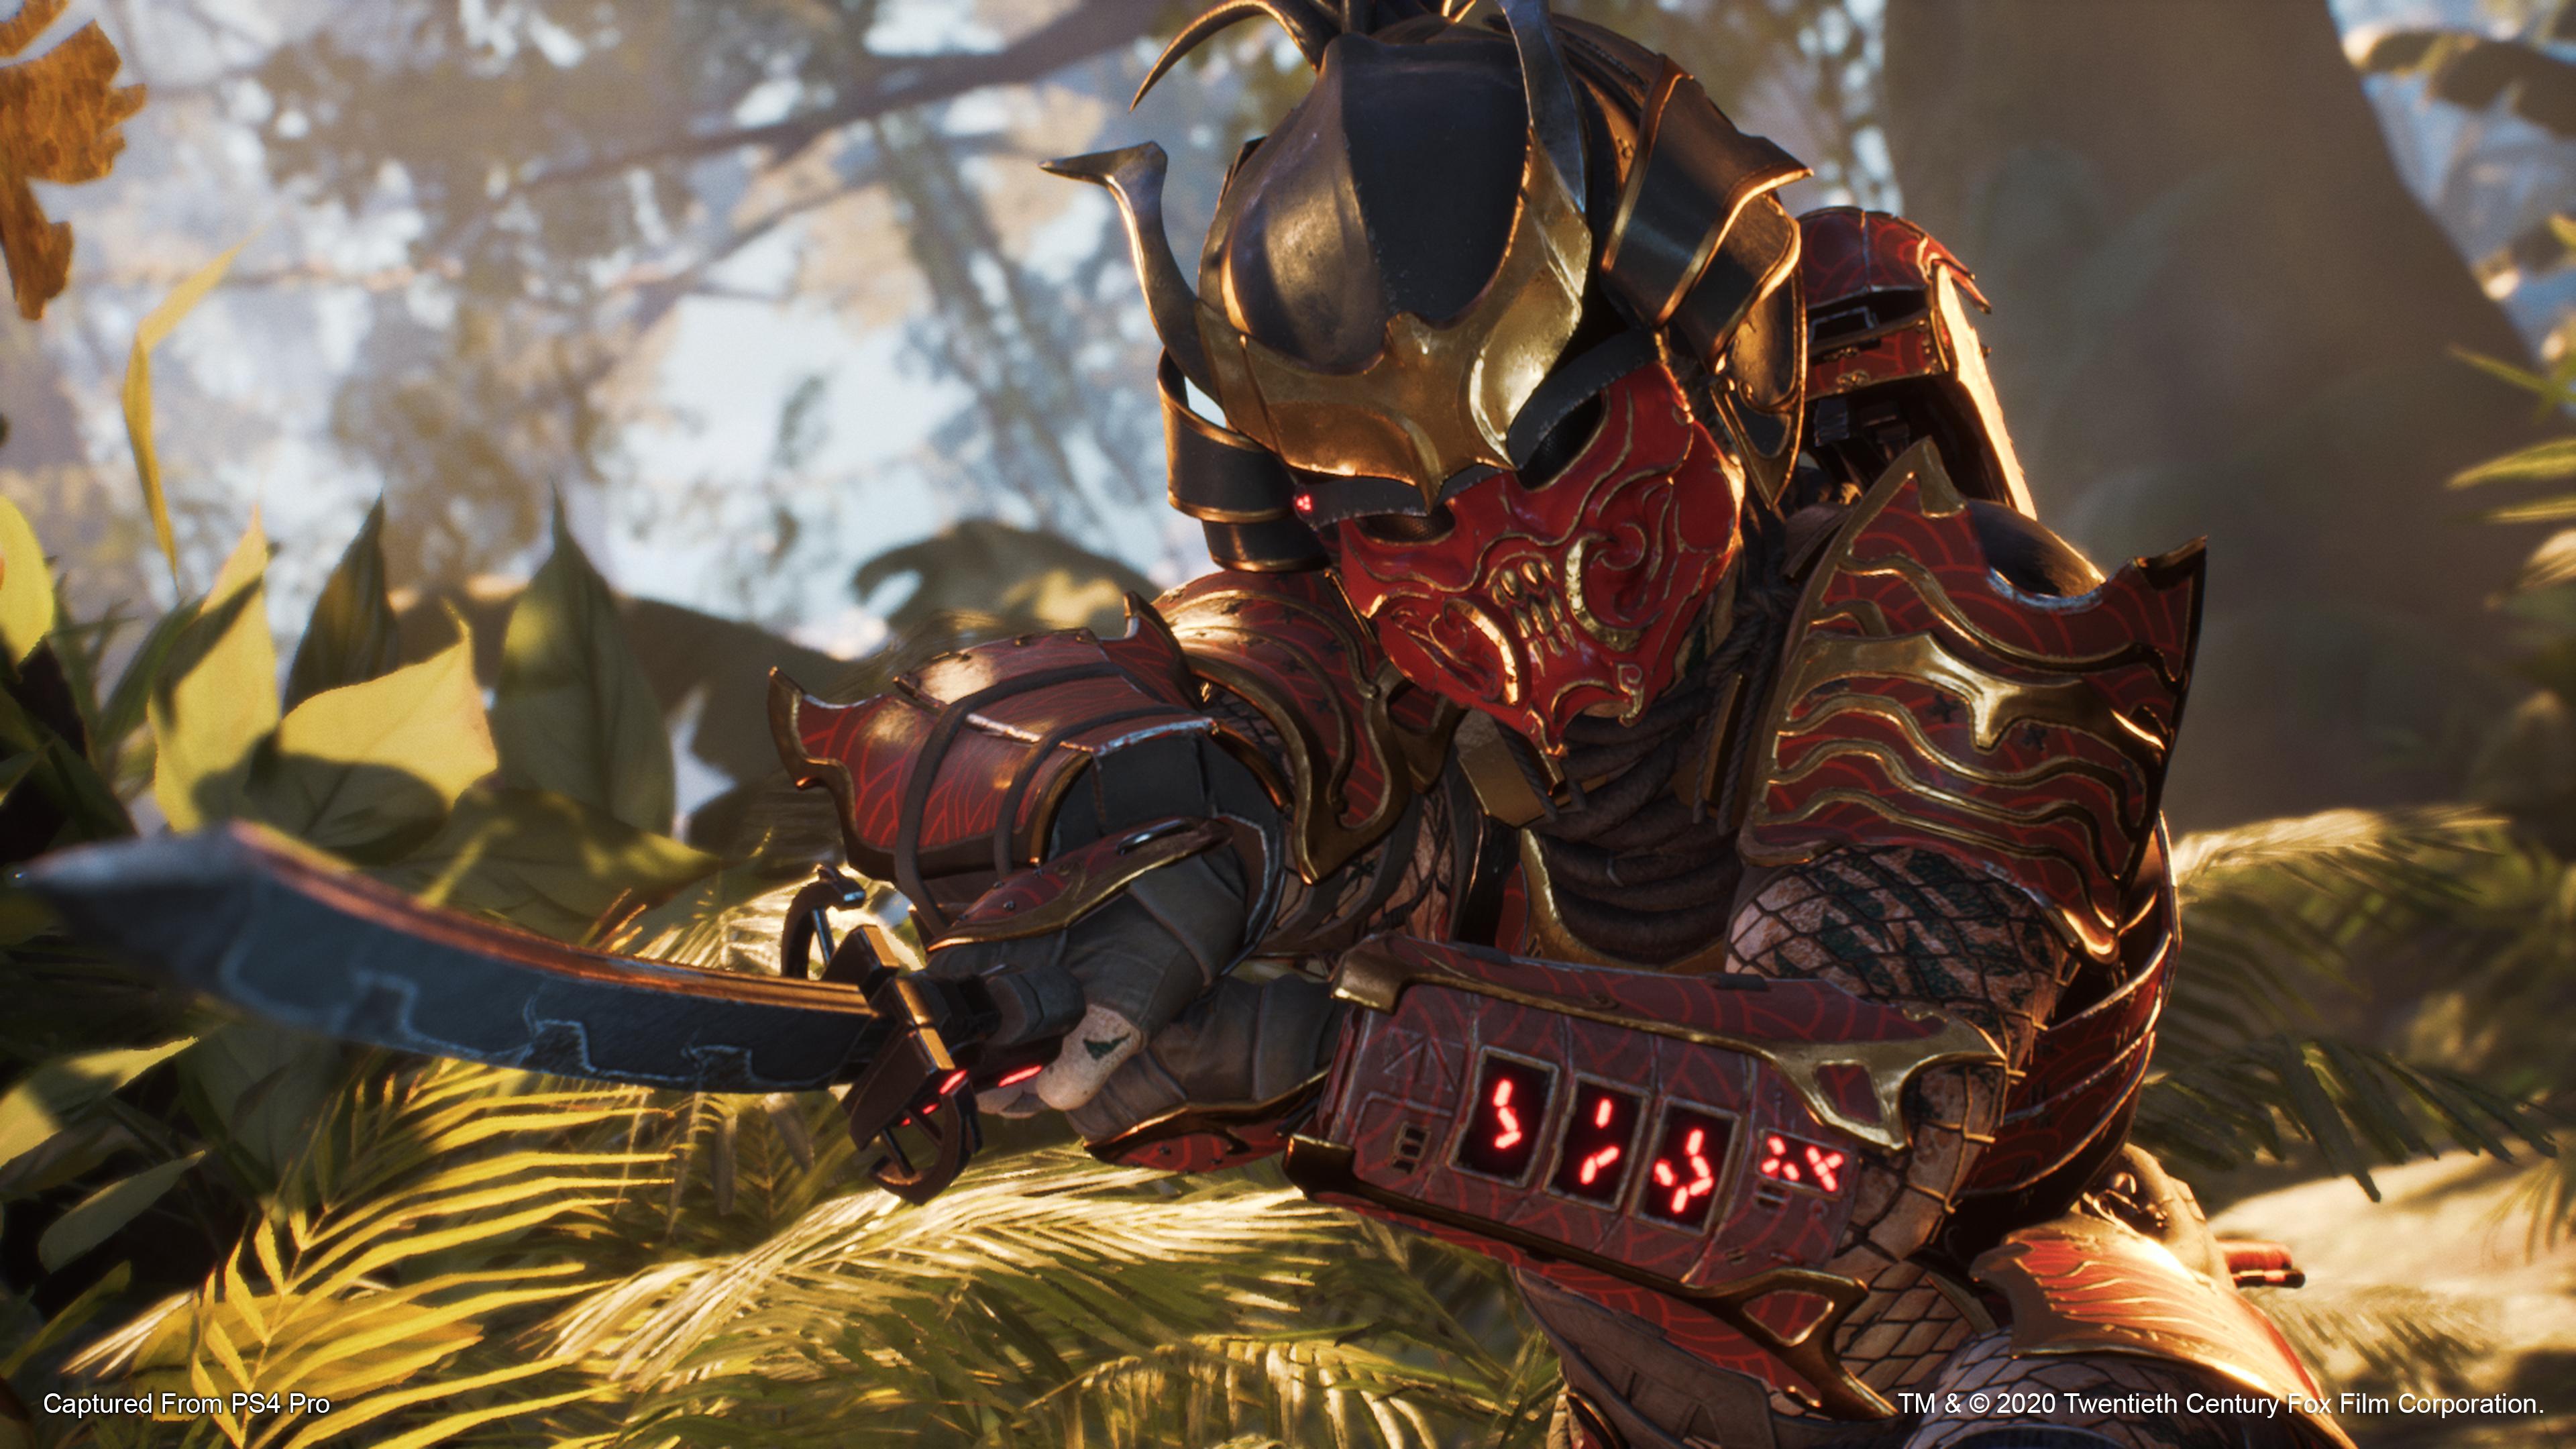 Predator: Hunting Grounds - Samurai Predator DLC Pack   WW (077b5745-e4b9-4553-bd0d-55b545523d4a)